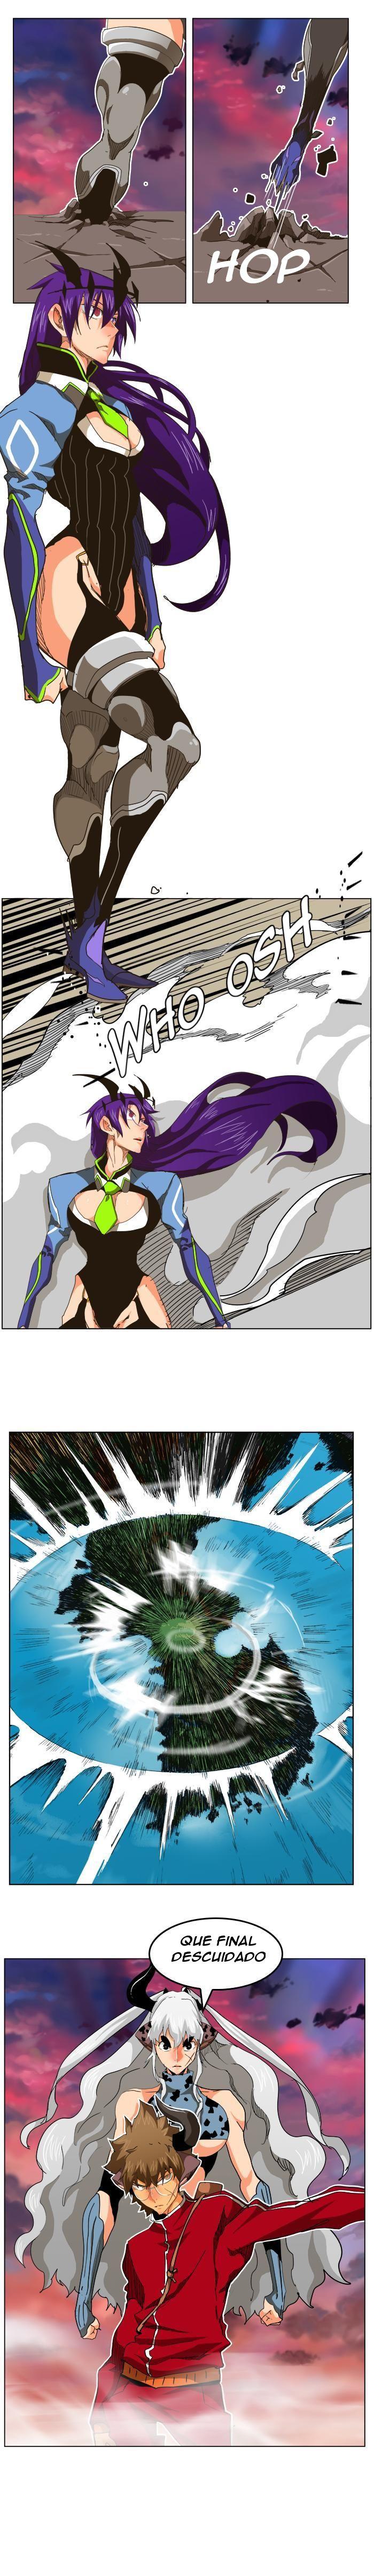 http://c5.ninemanga.com/es_manga/37/485/482226/aaba614dc246776411d5c6c1227ad0a7.jpg Page 6